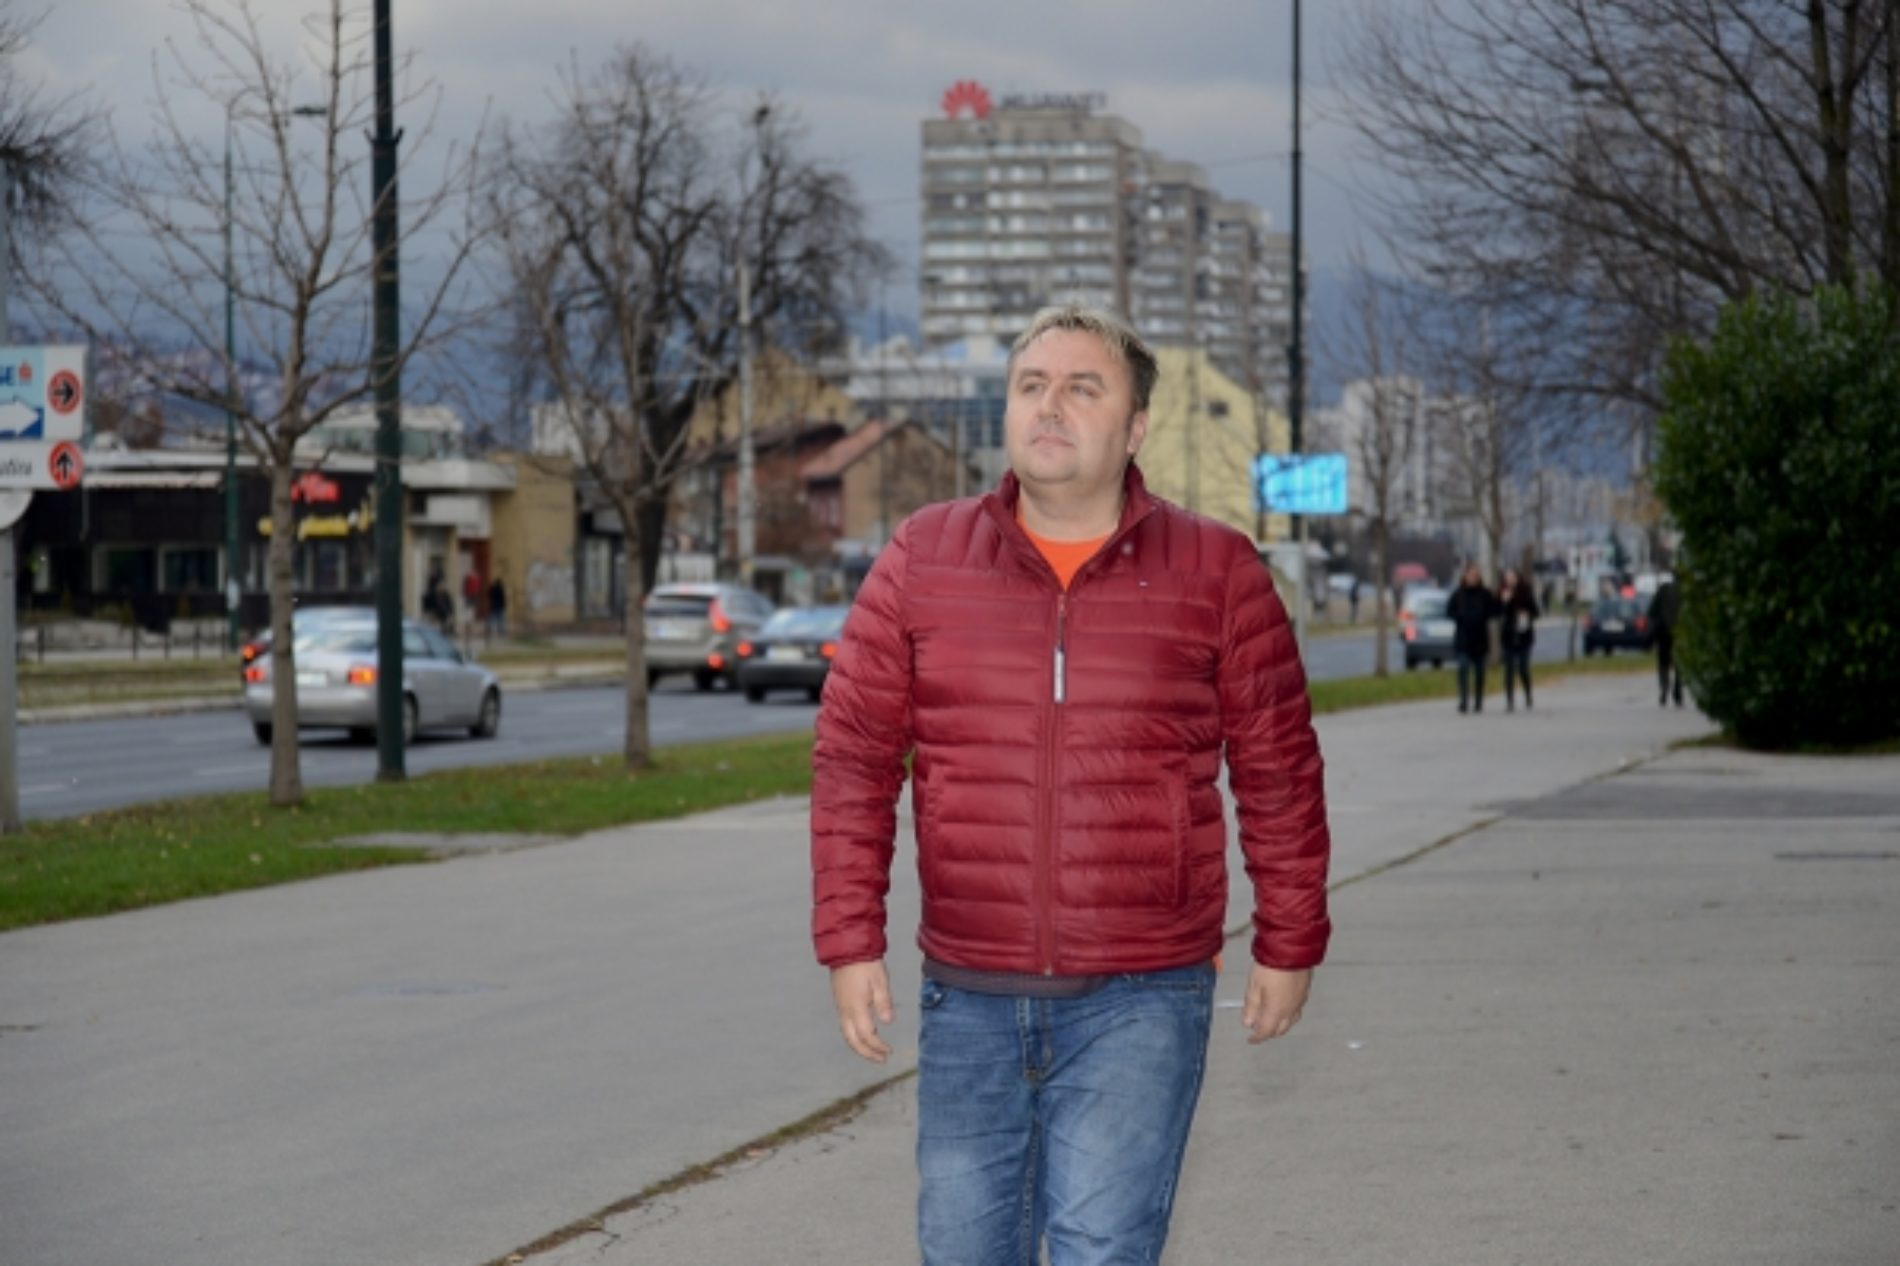 Avdo Huseinović snimio petnaesti dokumentarac. Priprema film o Husein-kapetanu Gradaščeviću